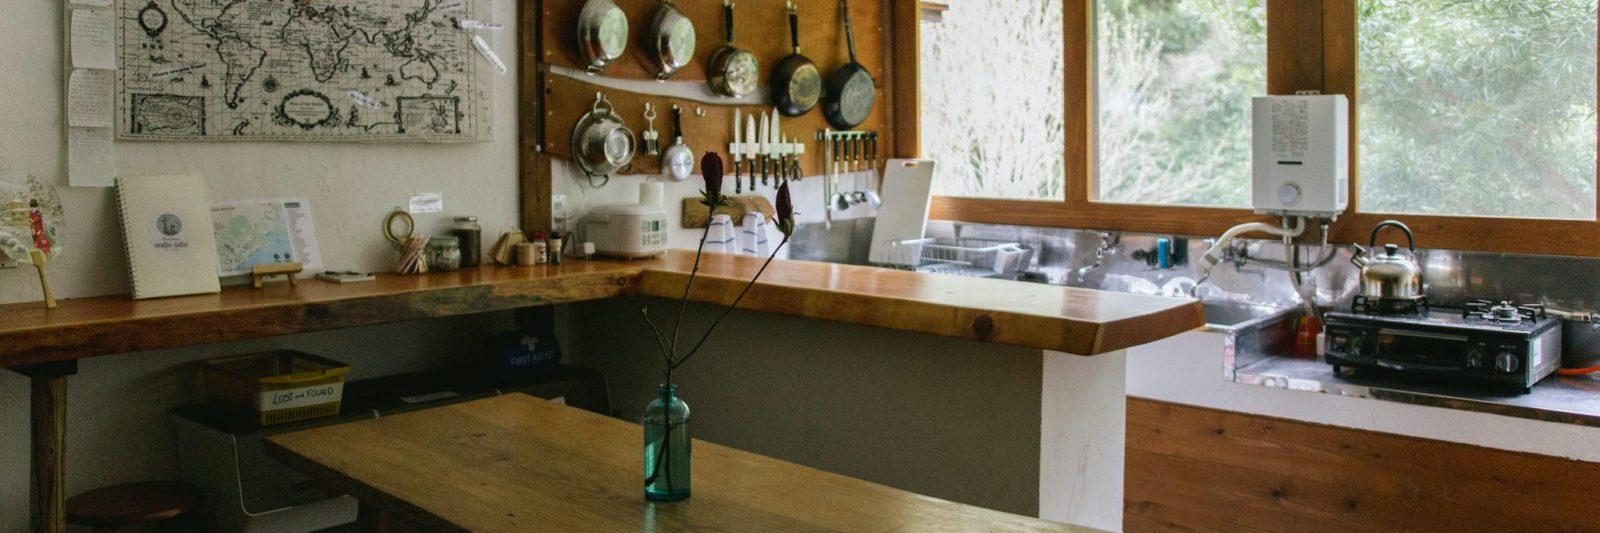 Retreat wabi-sabi Shimoda. Kitchen. The guesthouse has a communal kitchen.